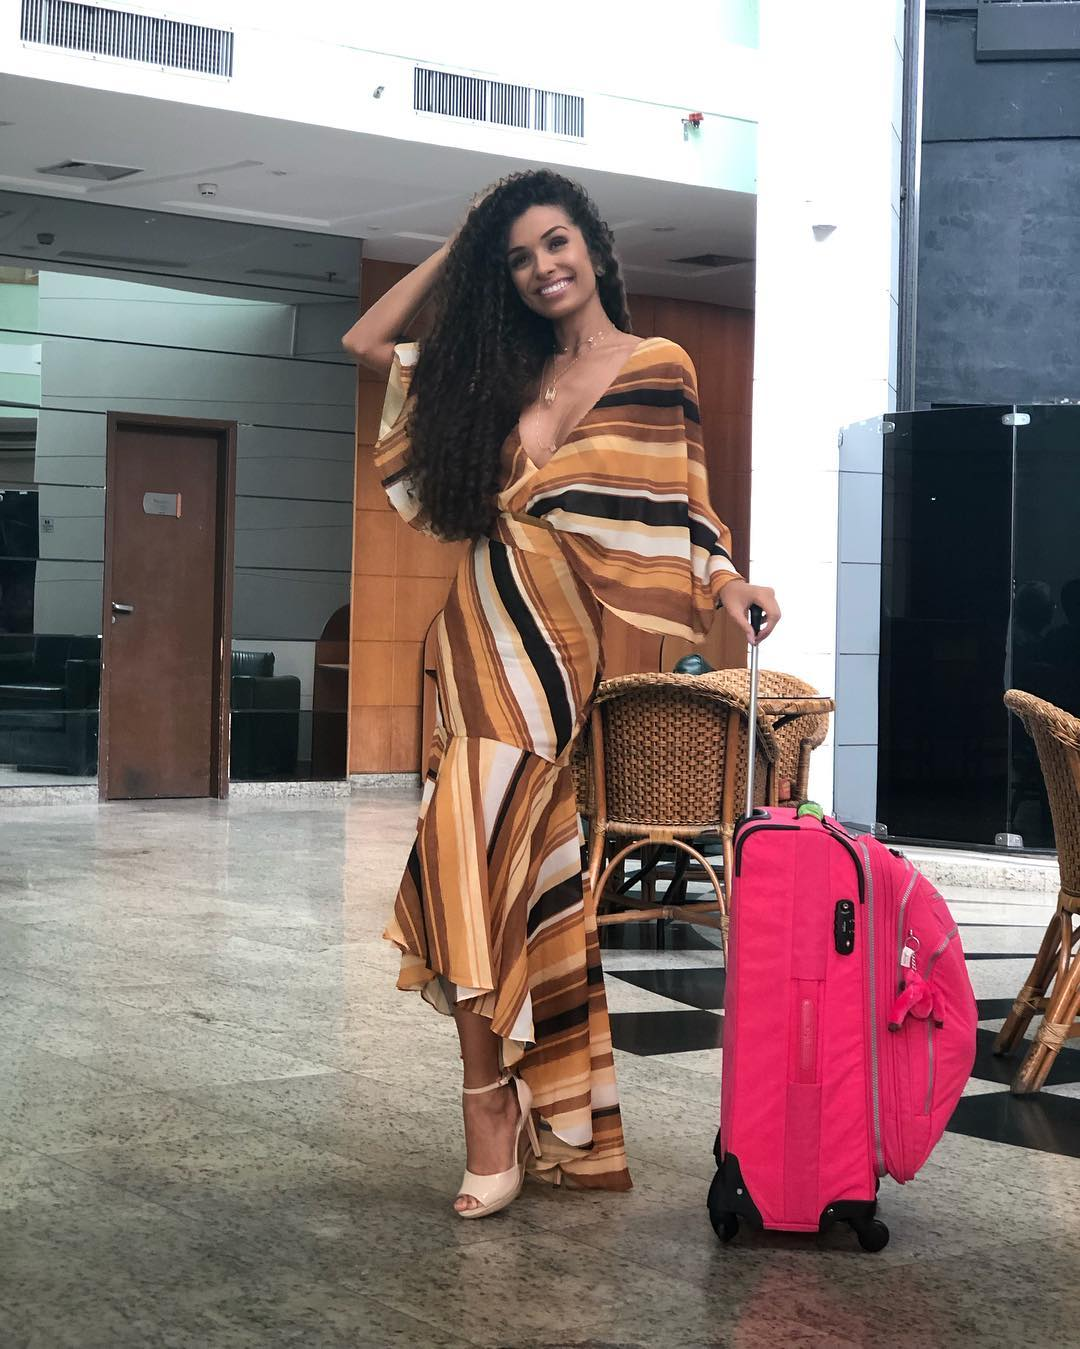 lorena alencar, miss amazonas 2019. 50837210